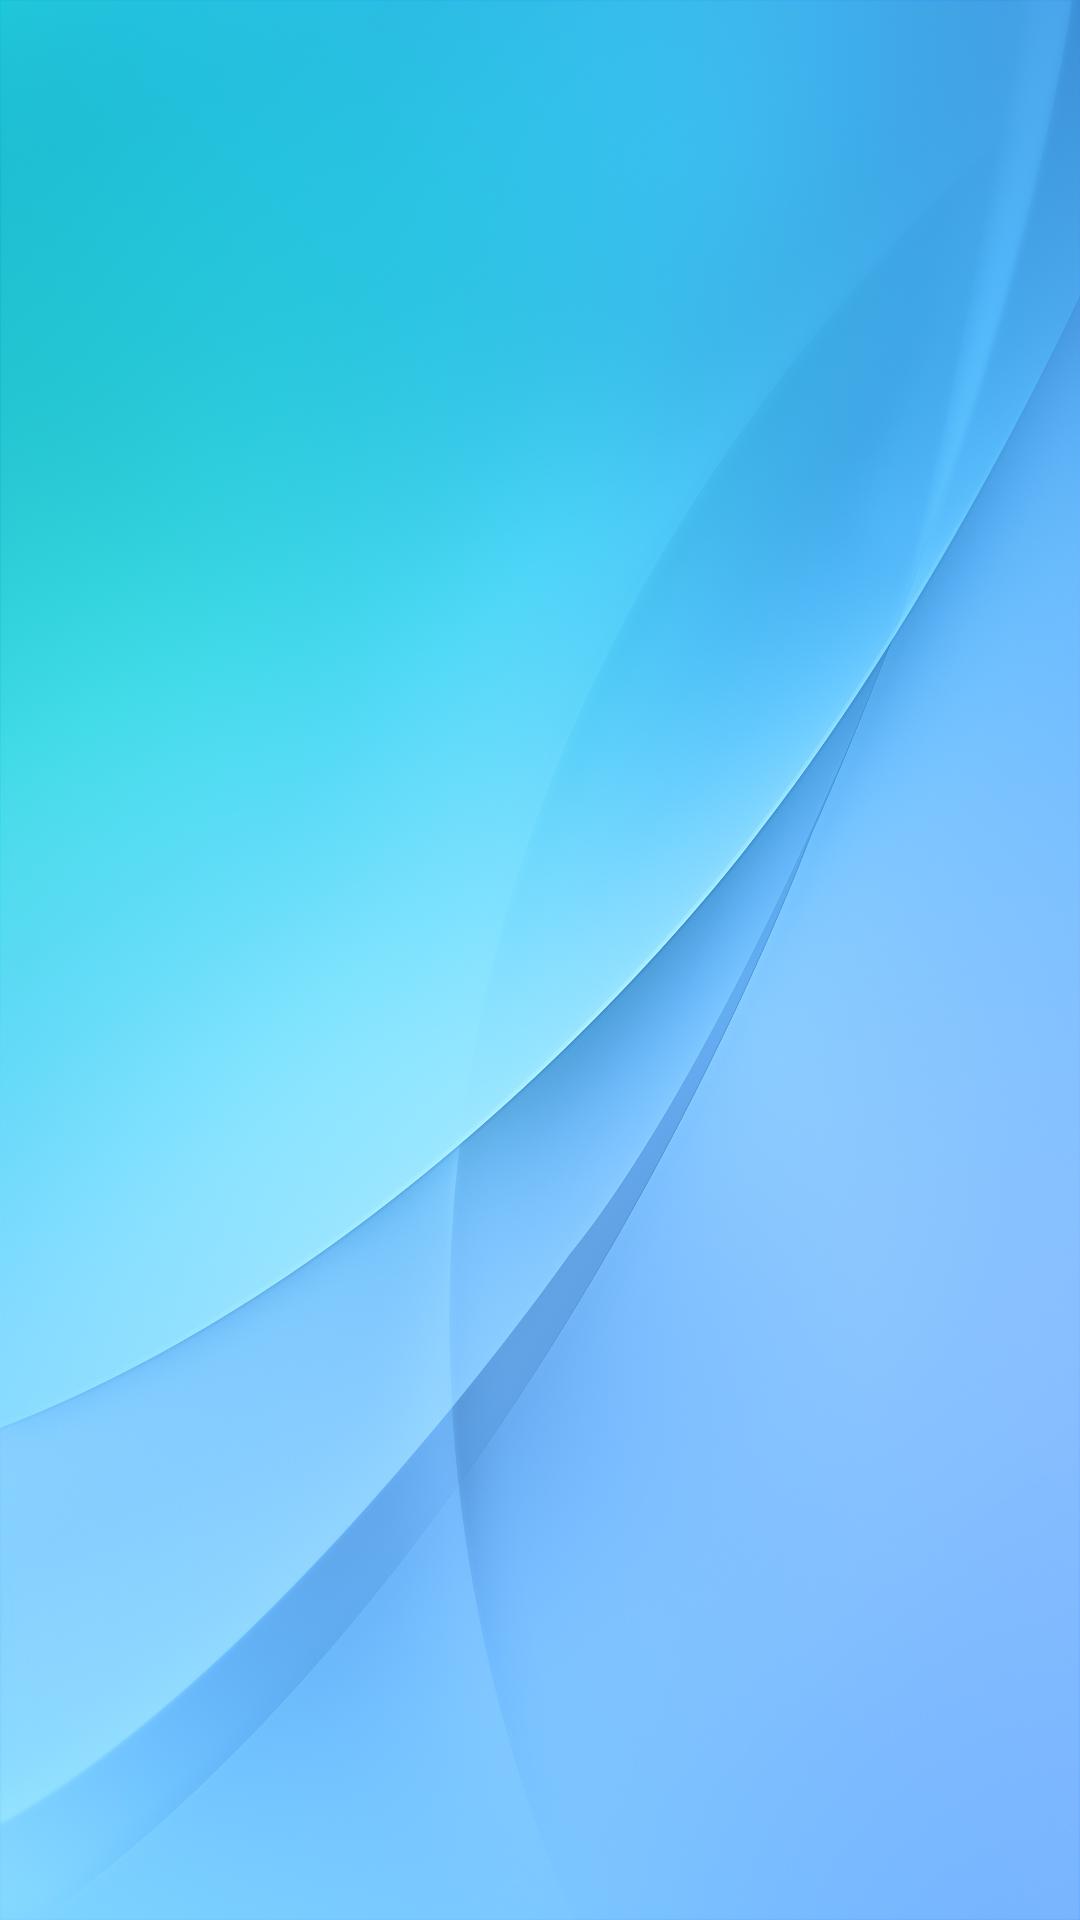 Download Miui 9 Xiaomi Mi 4c And Mi 5x Stock Wallpapers